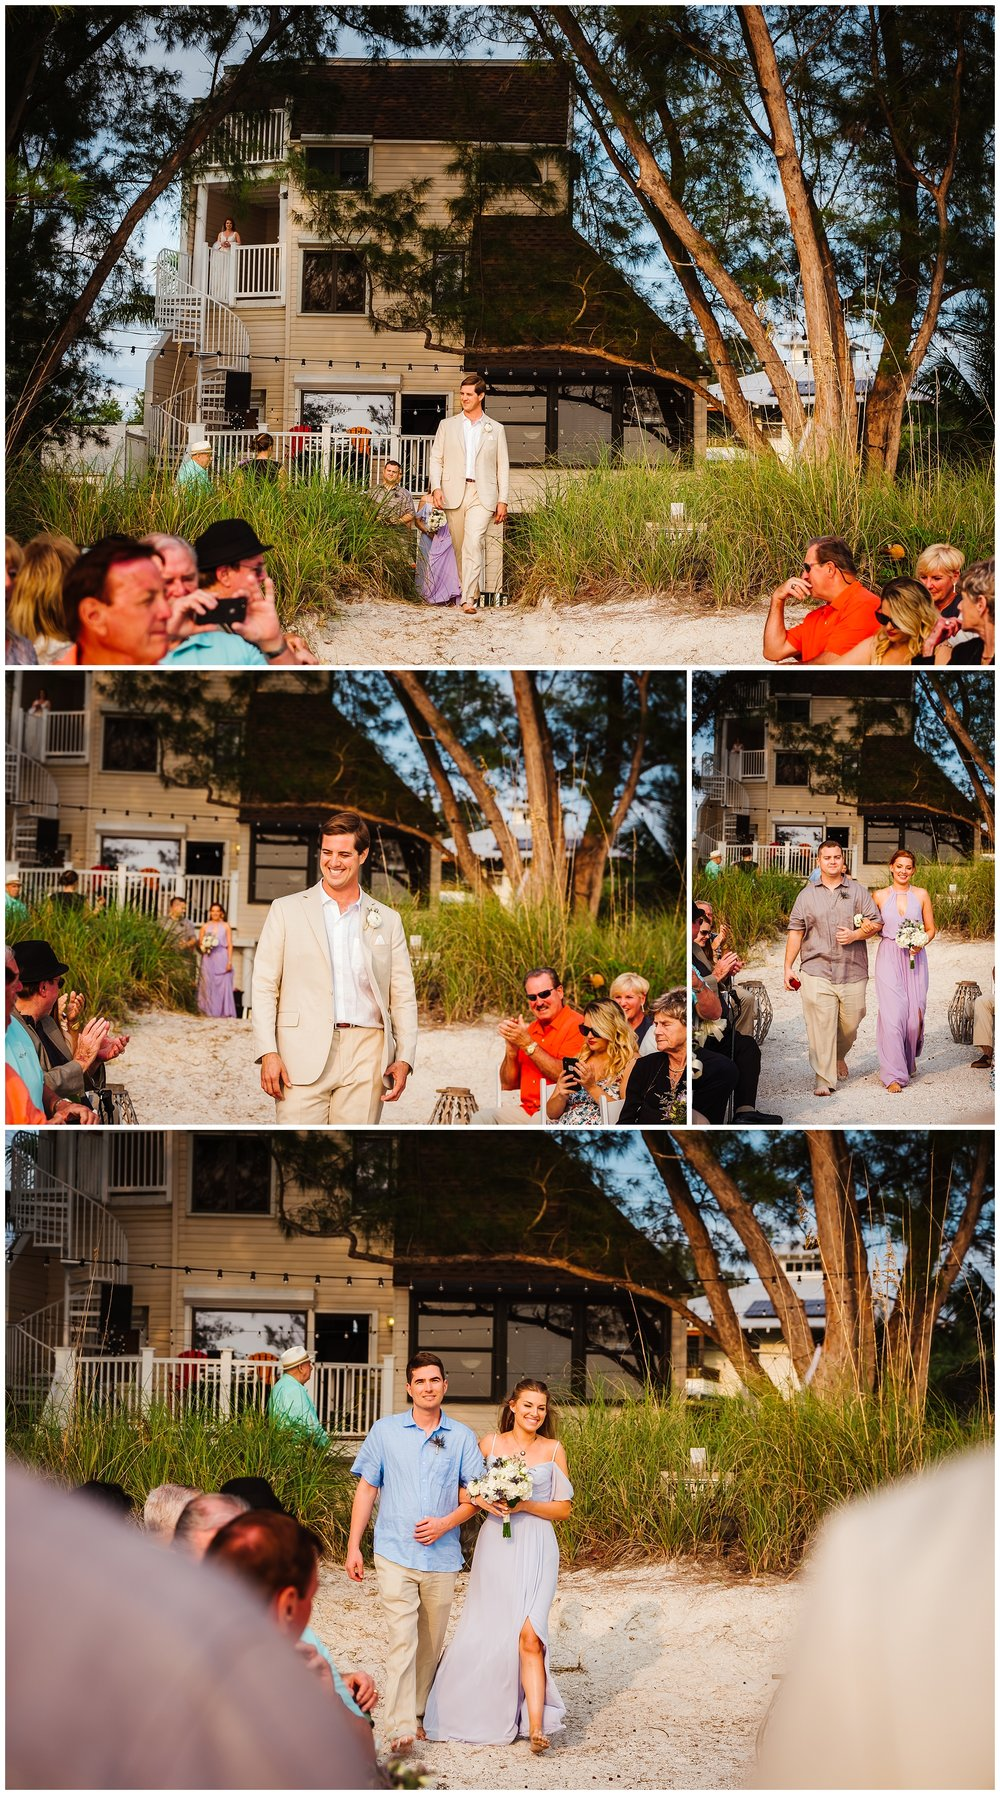 tampa-st-pete-wedding-photographer-indian-rocks-beach-mermaid-train-redhead_0129.jpg